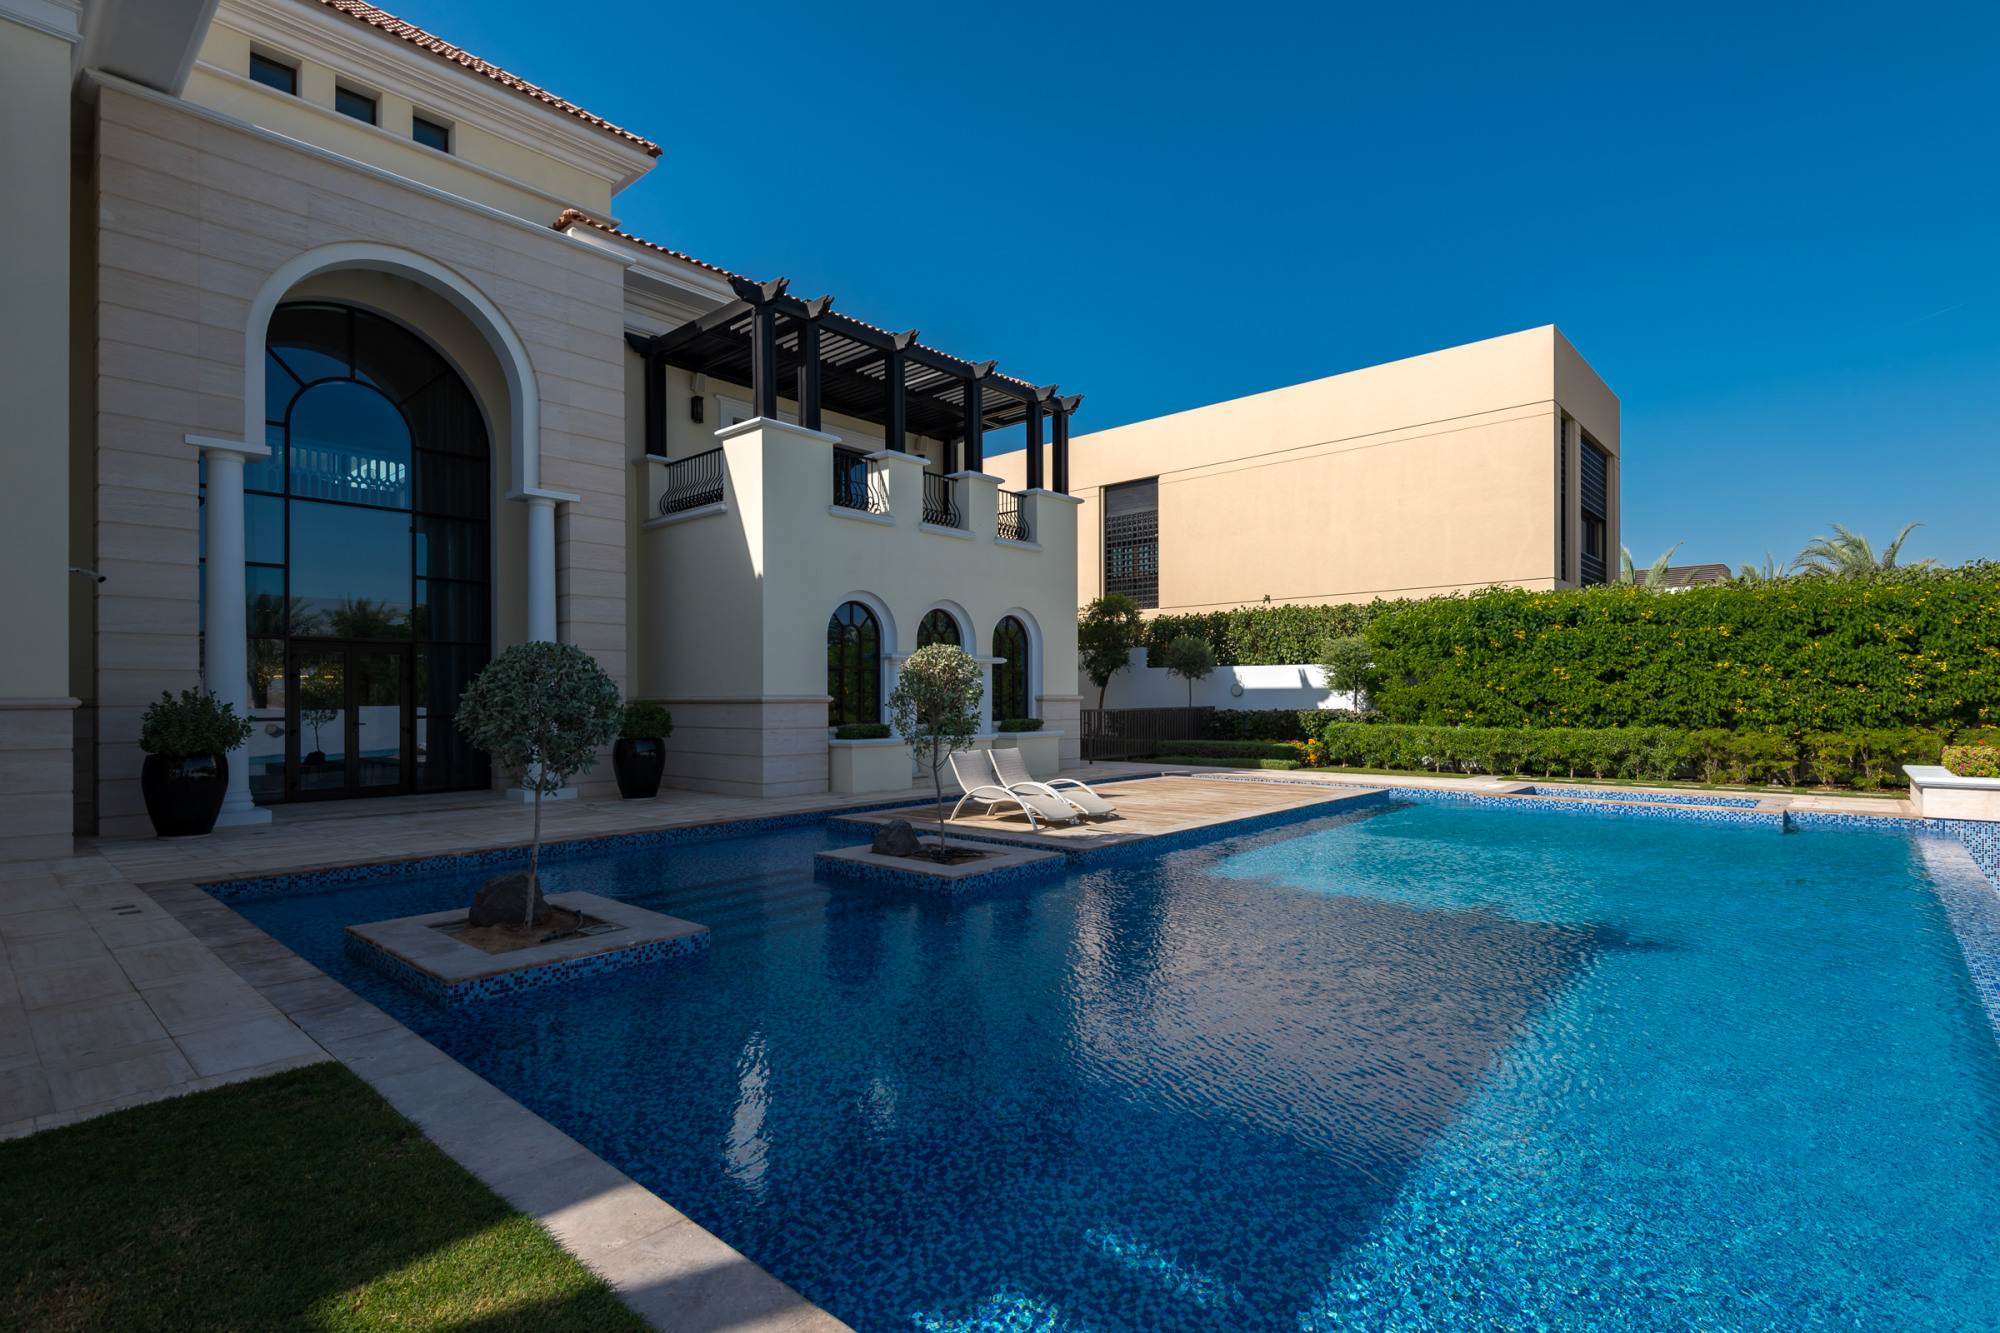 Huge Mansion Mediterranean Style Private Location